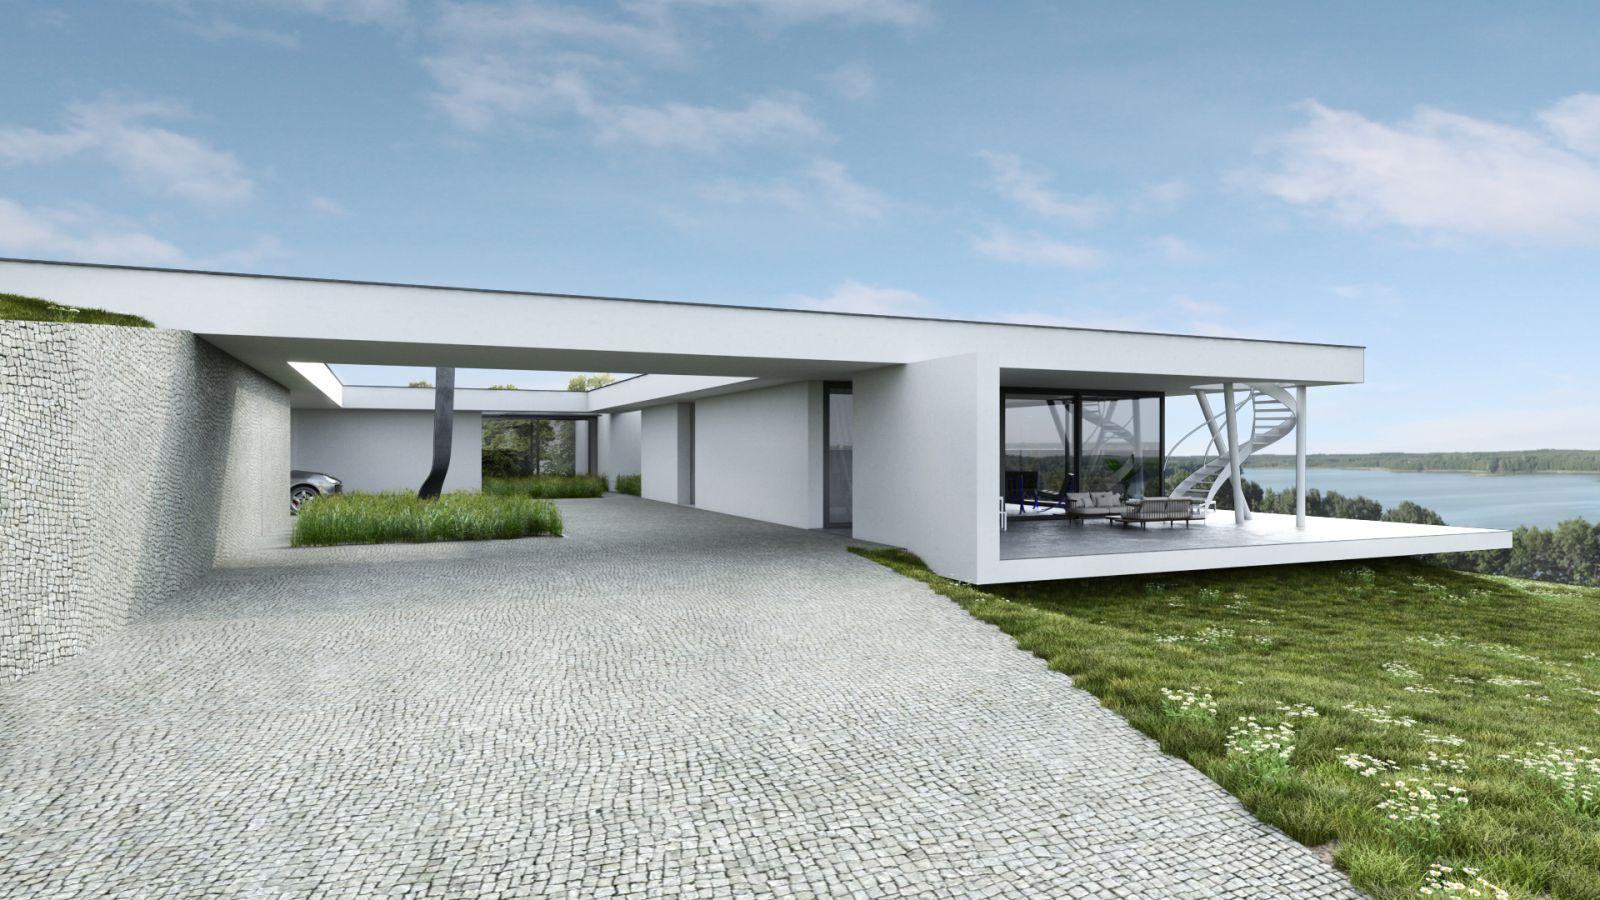 Architect Design House Tanzania Html on